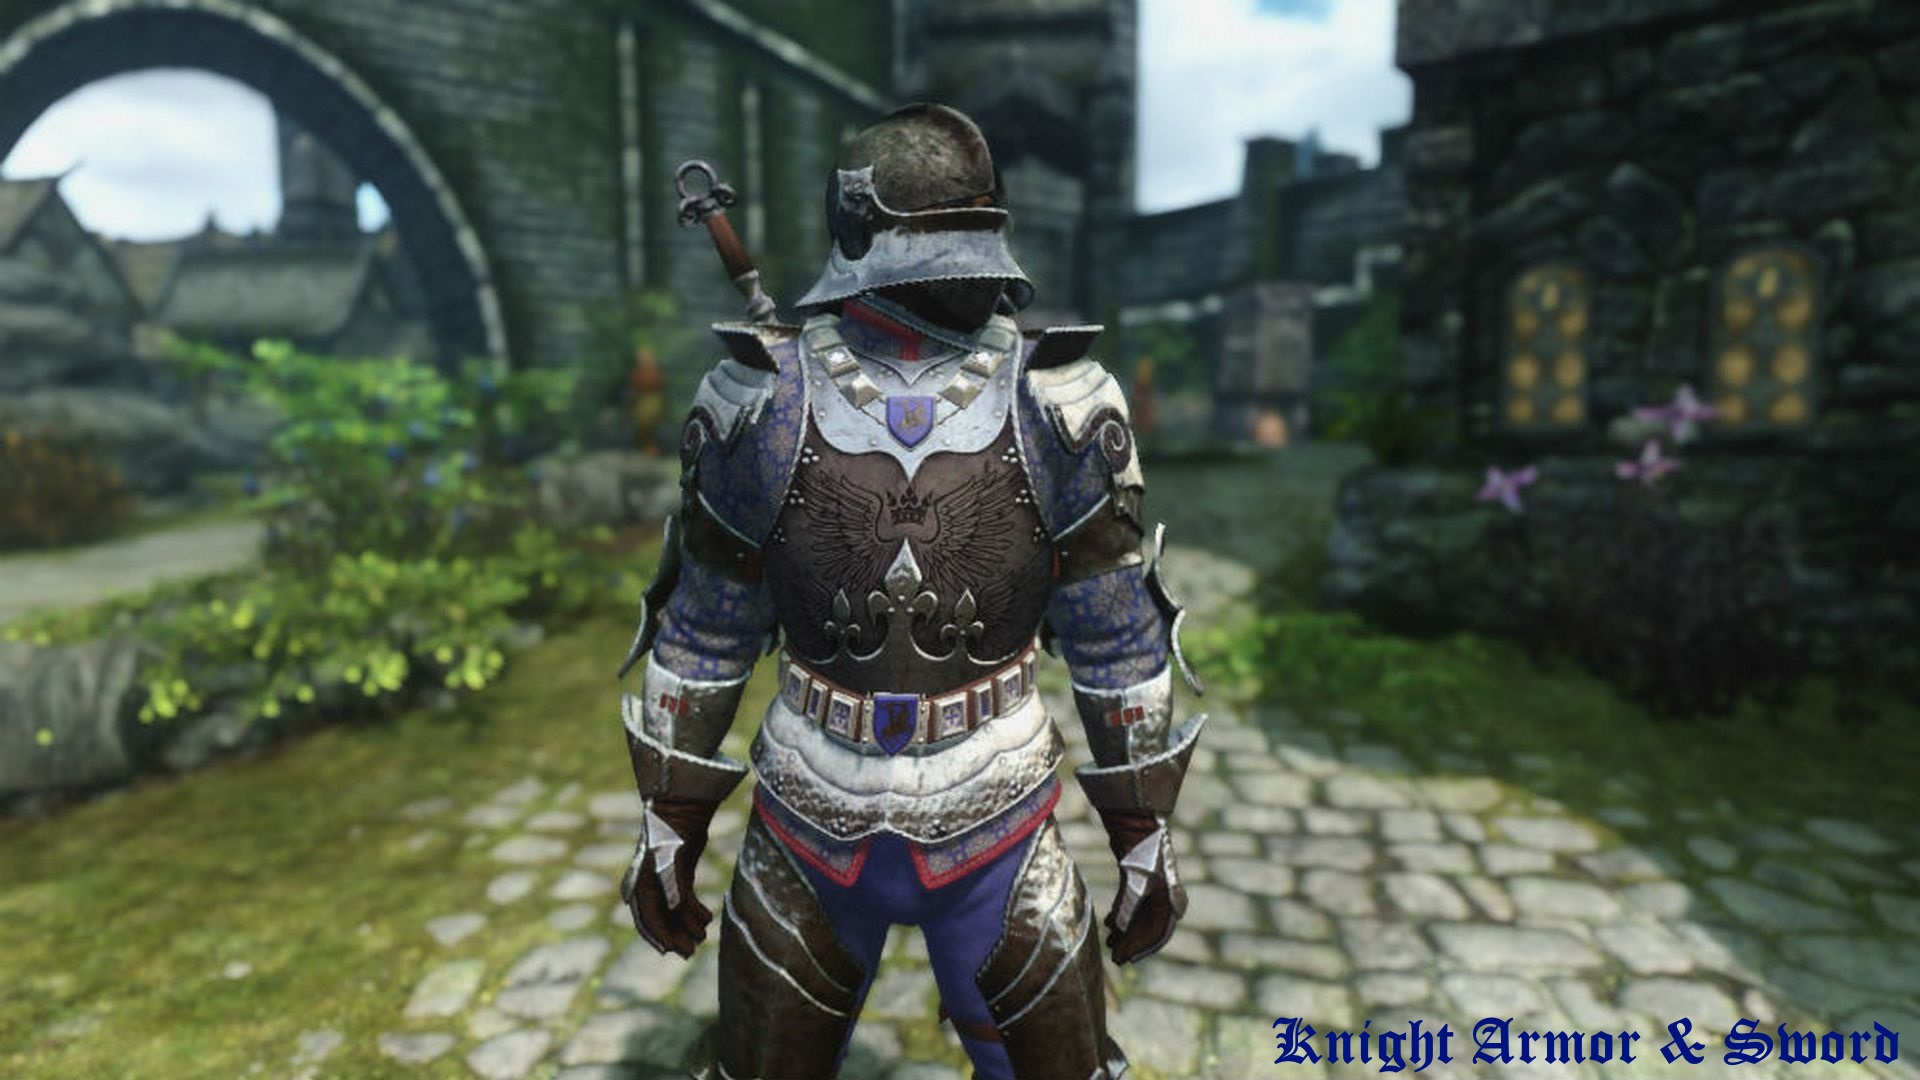 Knight Armor and Sword 01.jpg